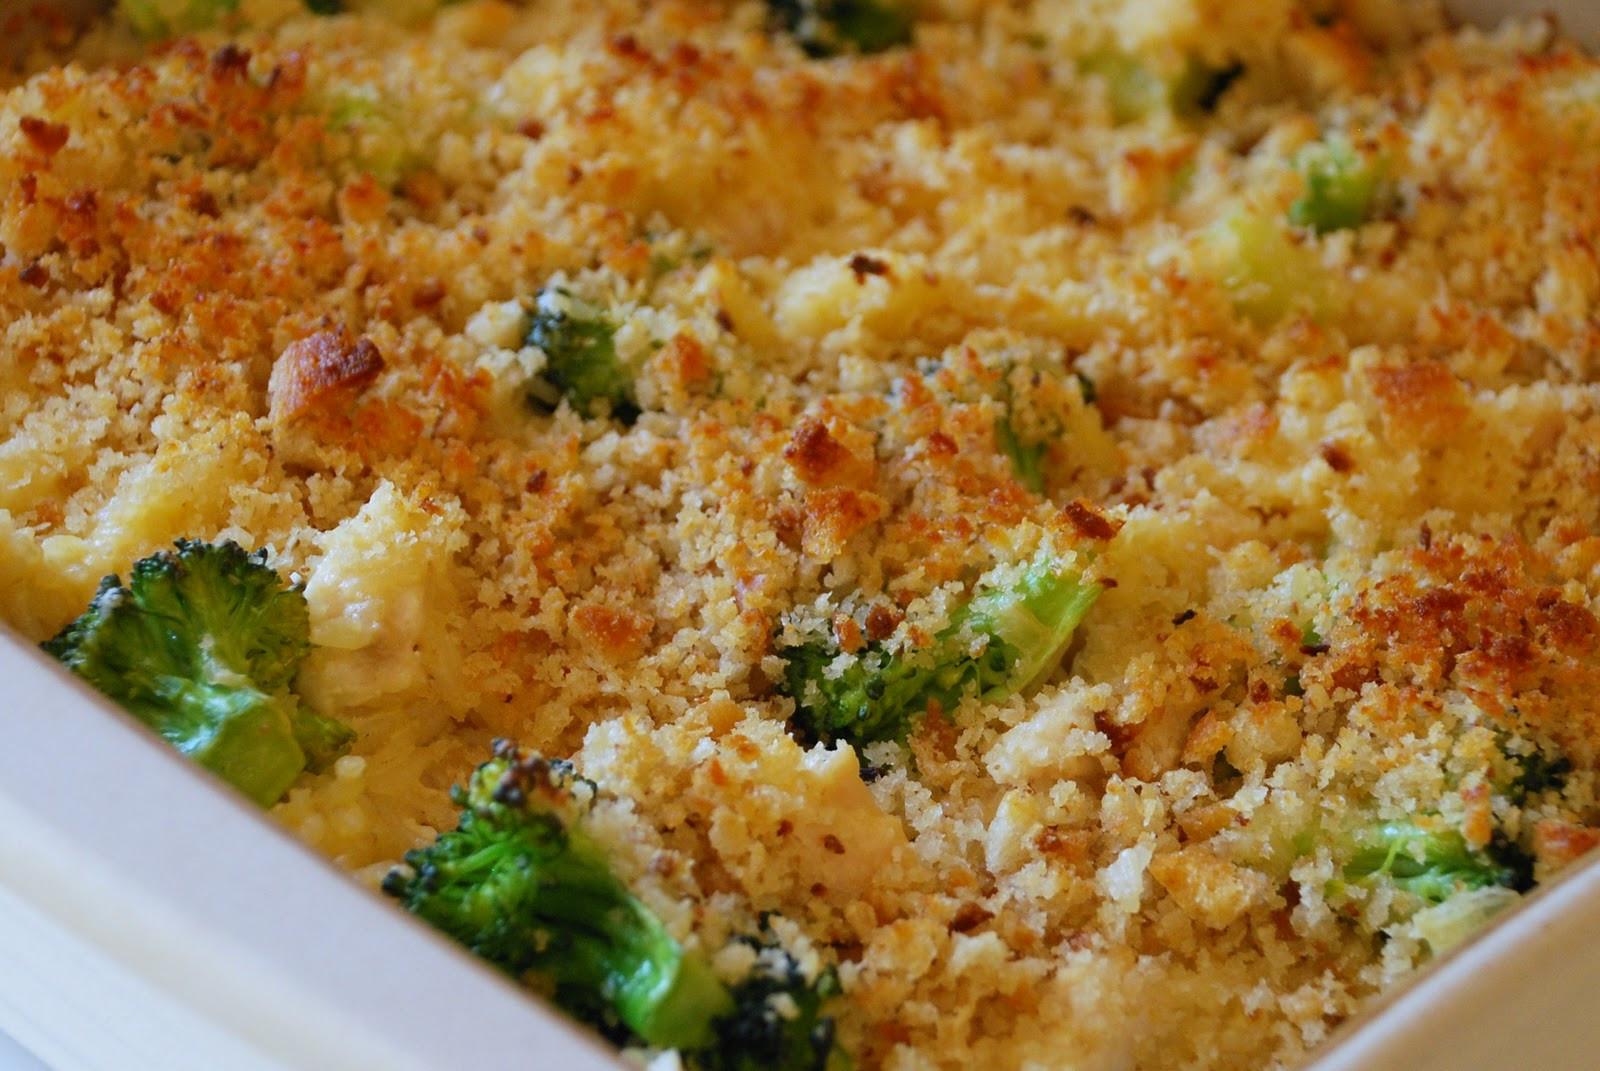 Cheesy Broccoli Casserole  Everyday Insanity Cheesy Broccoli and Rice Casserole